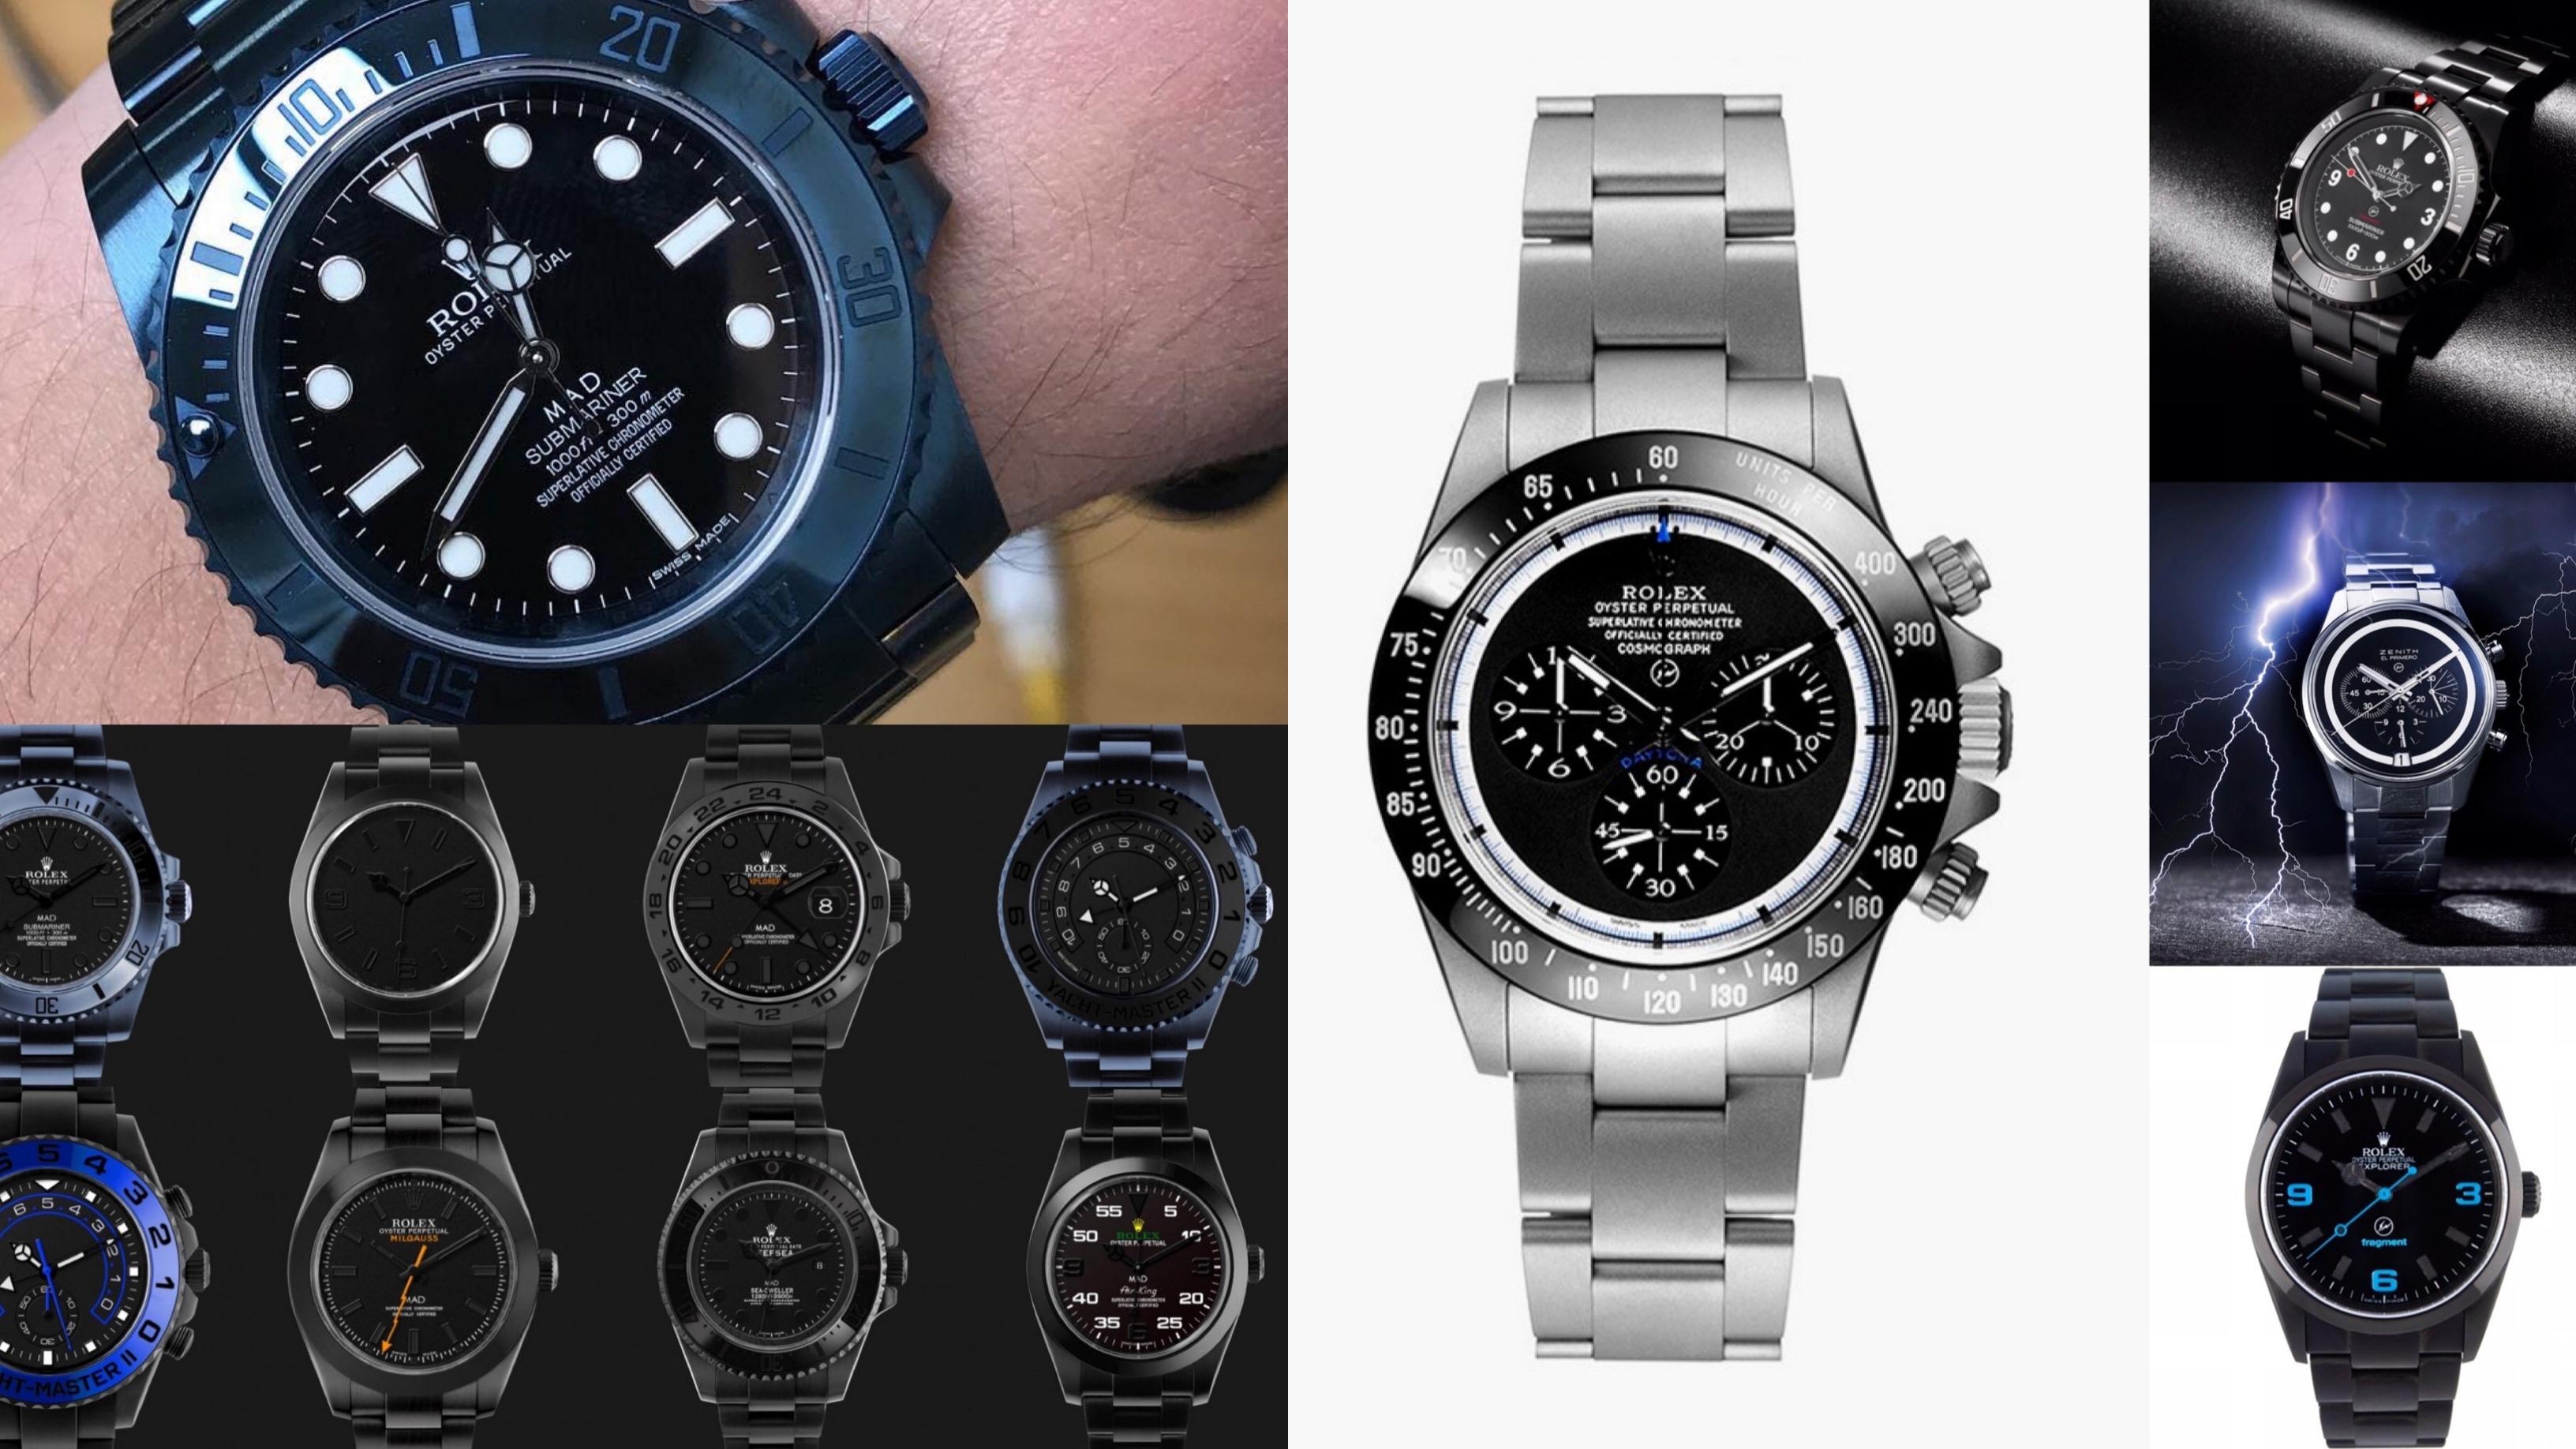 【Feature】【#Holyselector Vol.014 定製改腕錶品牌崛起 不再只是勞力無止境】 – HOLYCRAZE